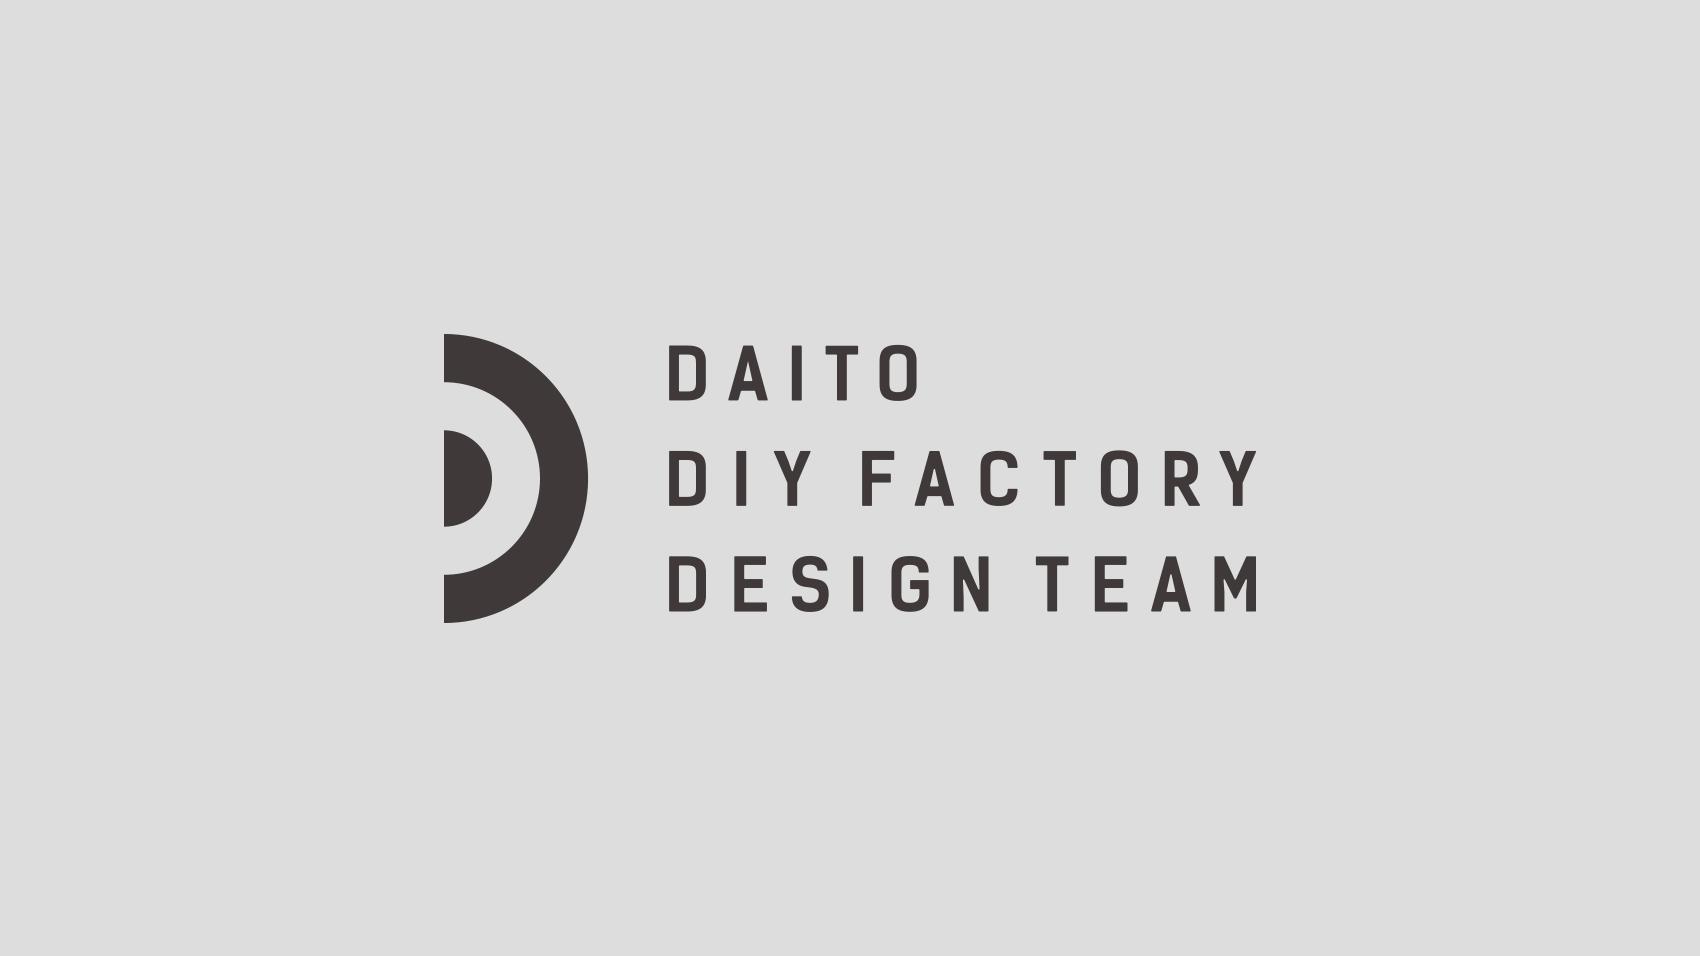 DAITO DIY FACTORY LOGO